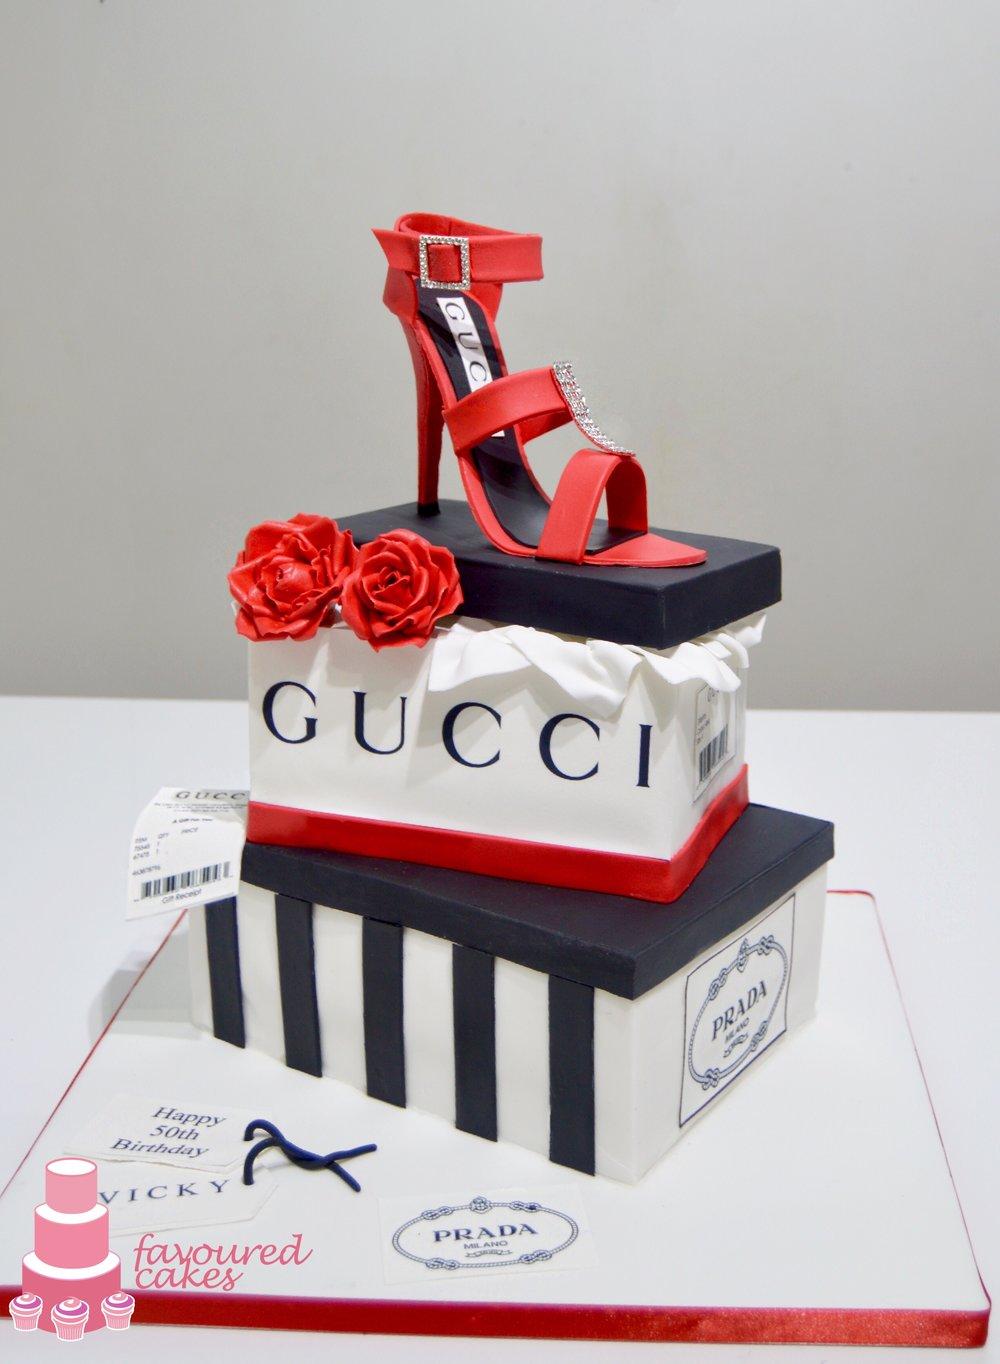 Gucci Prada Cake G02